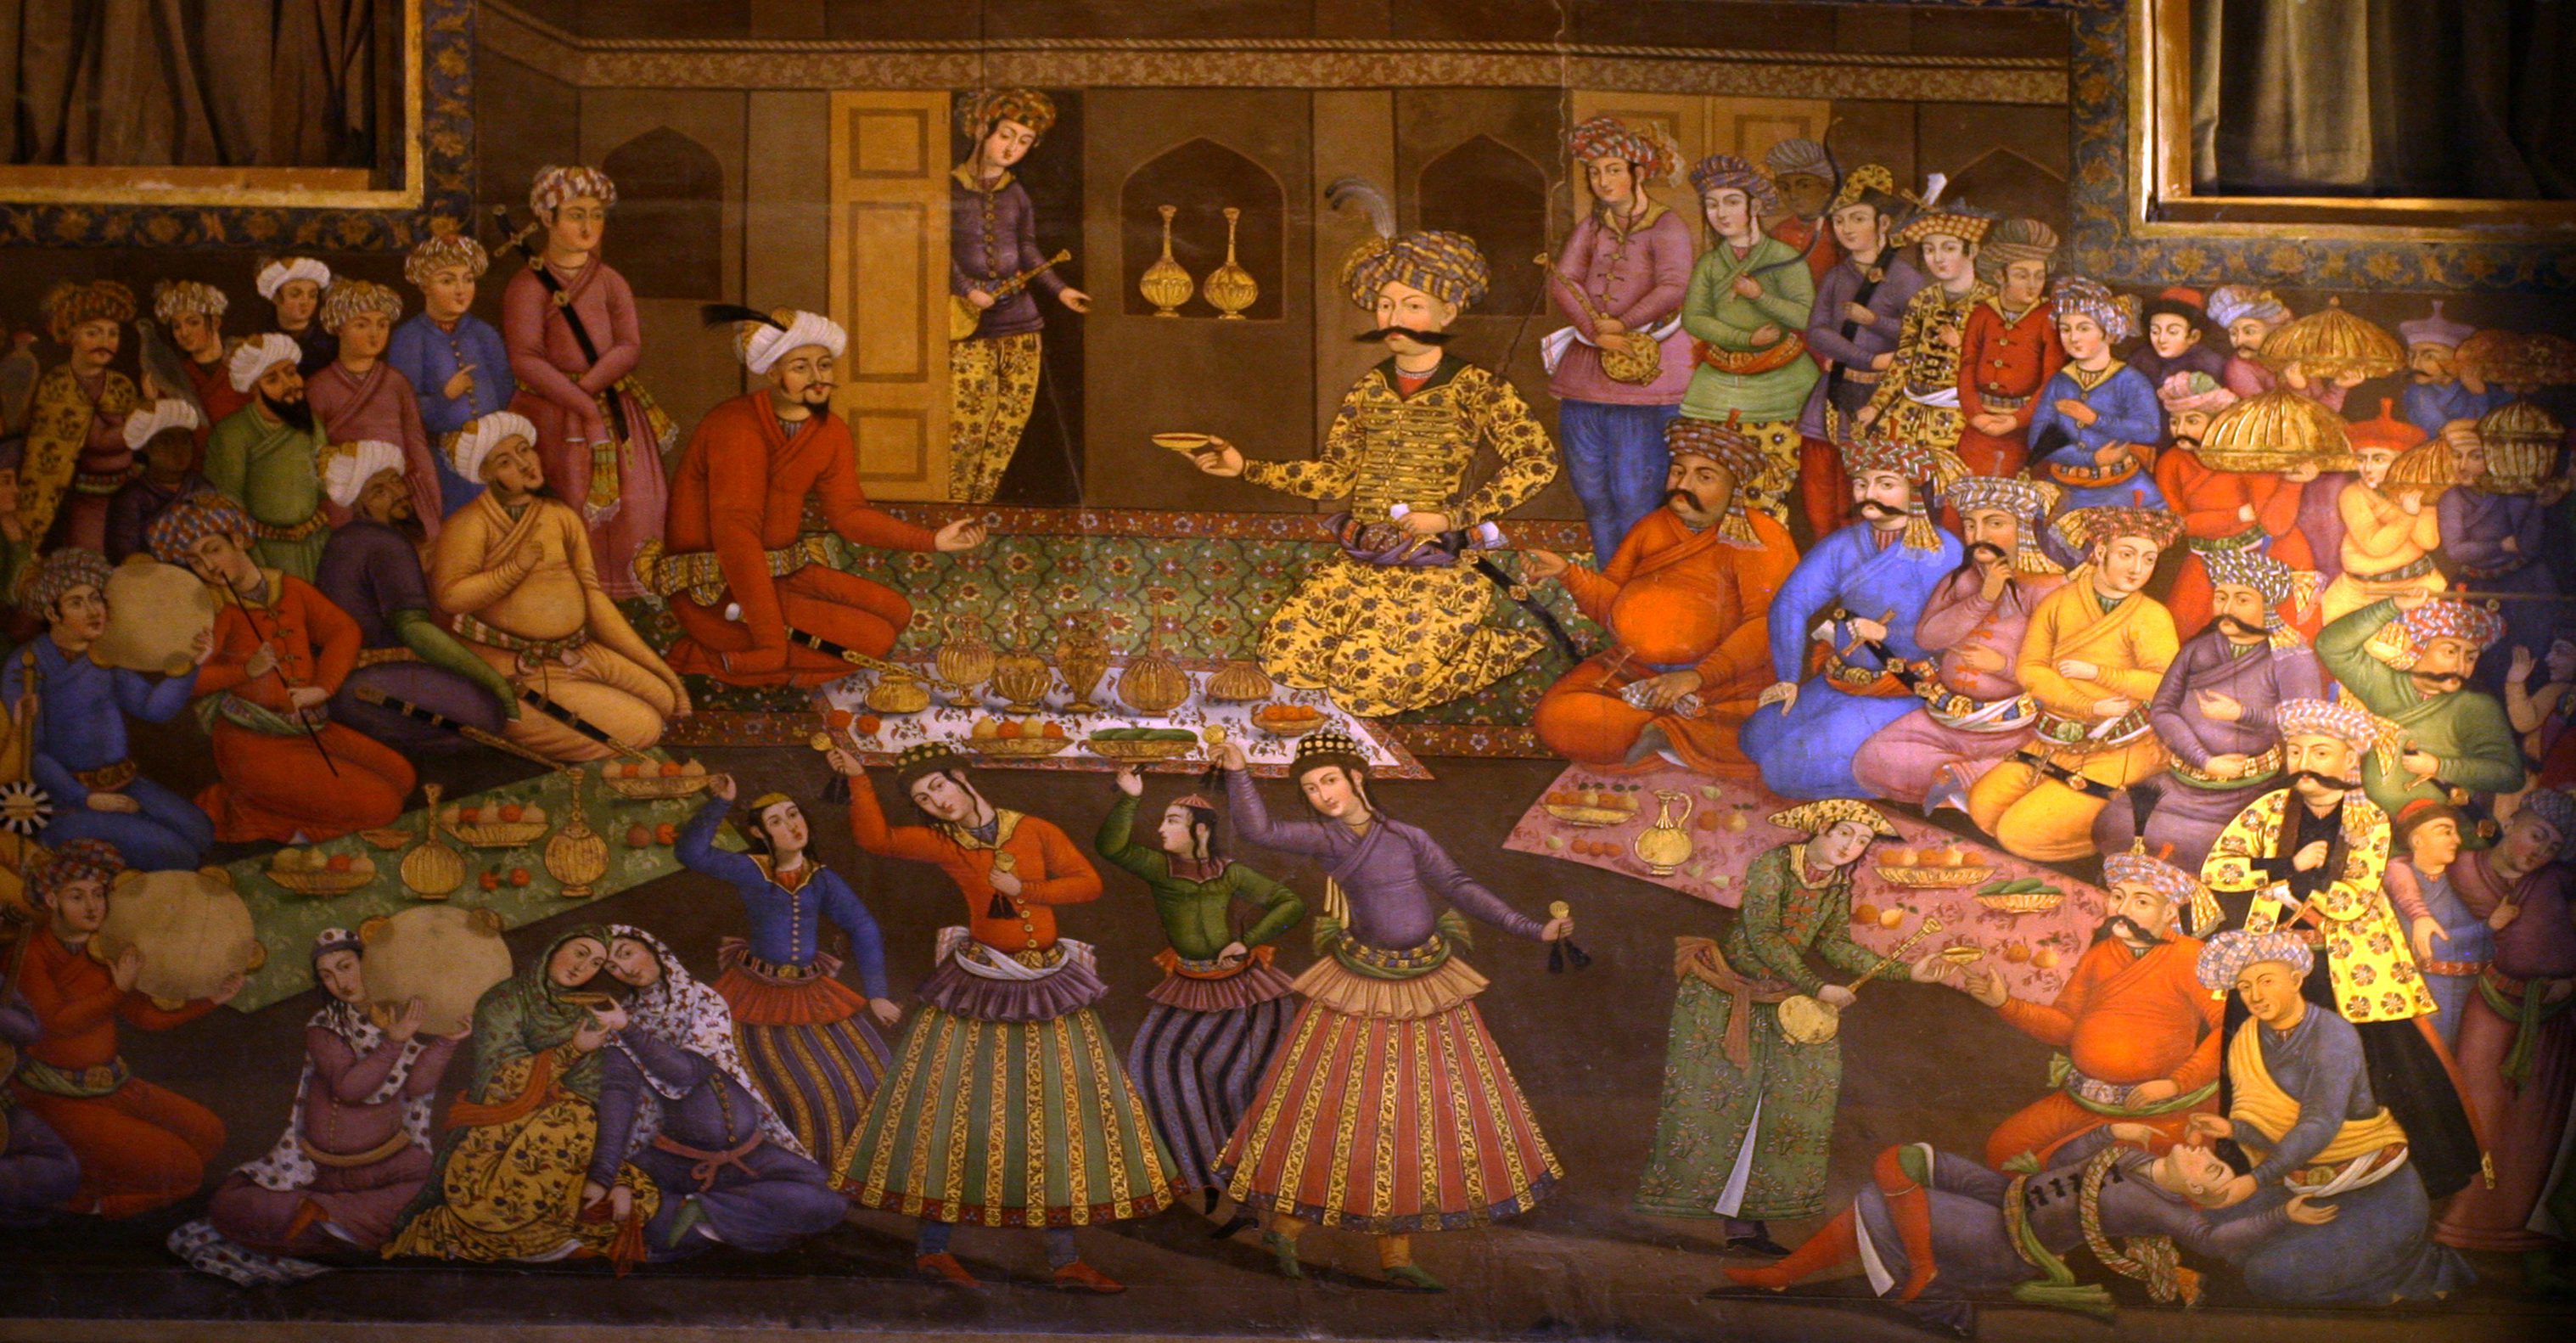 28 March, 6pm – Sydney Asian Art Series – Seeing Taste: Art, Cuisine and Urbanity in Safavid Persia/Iran